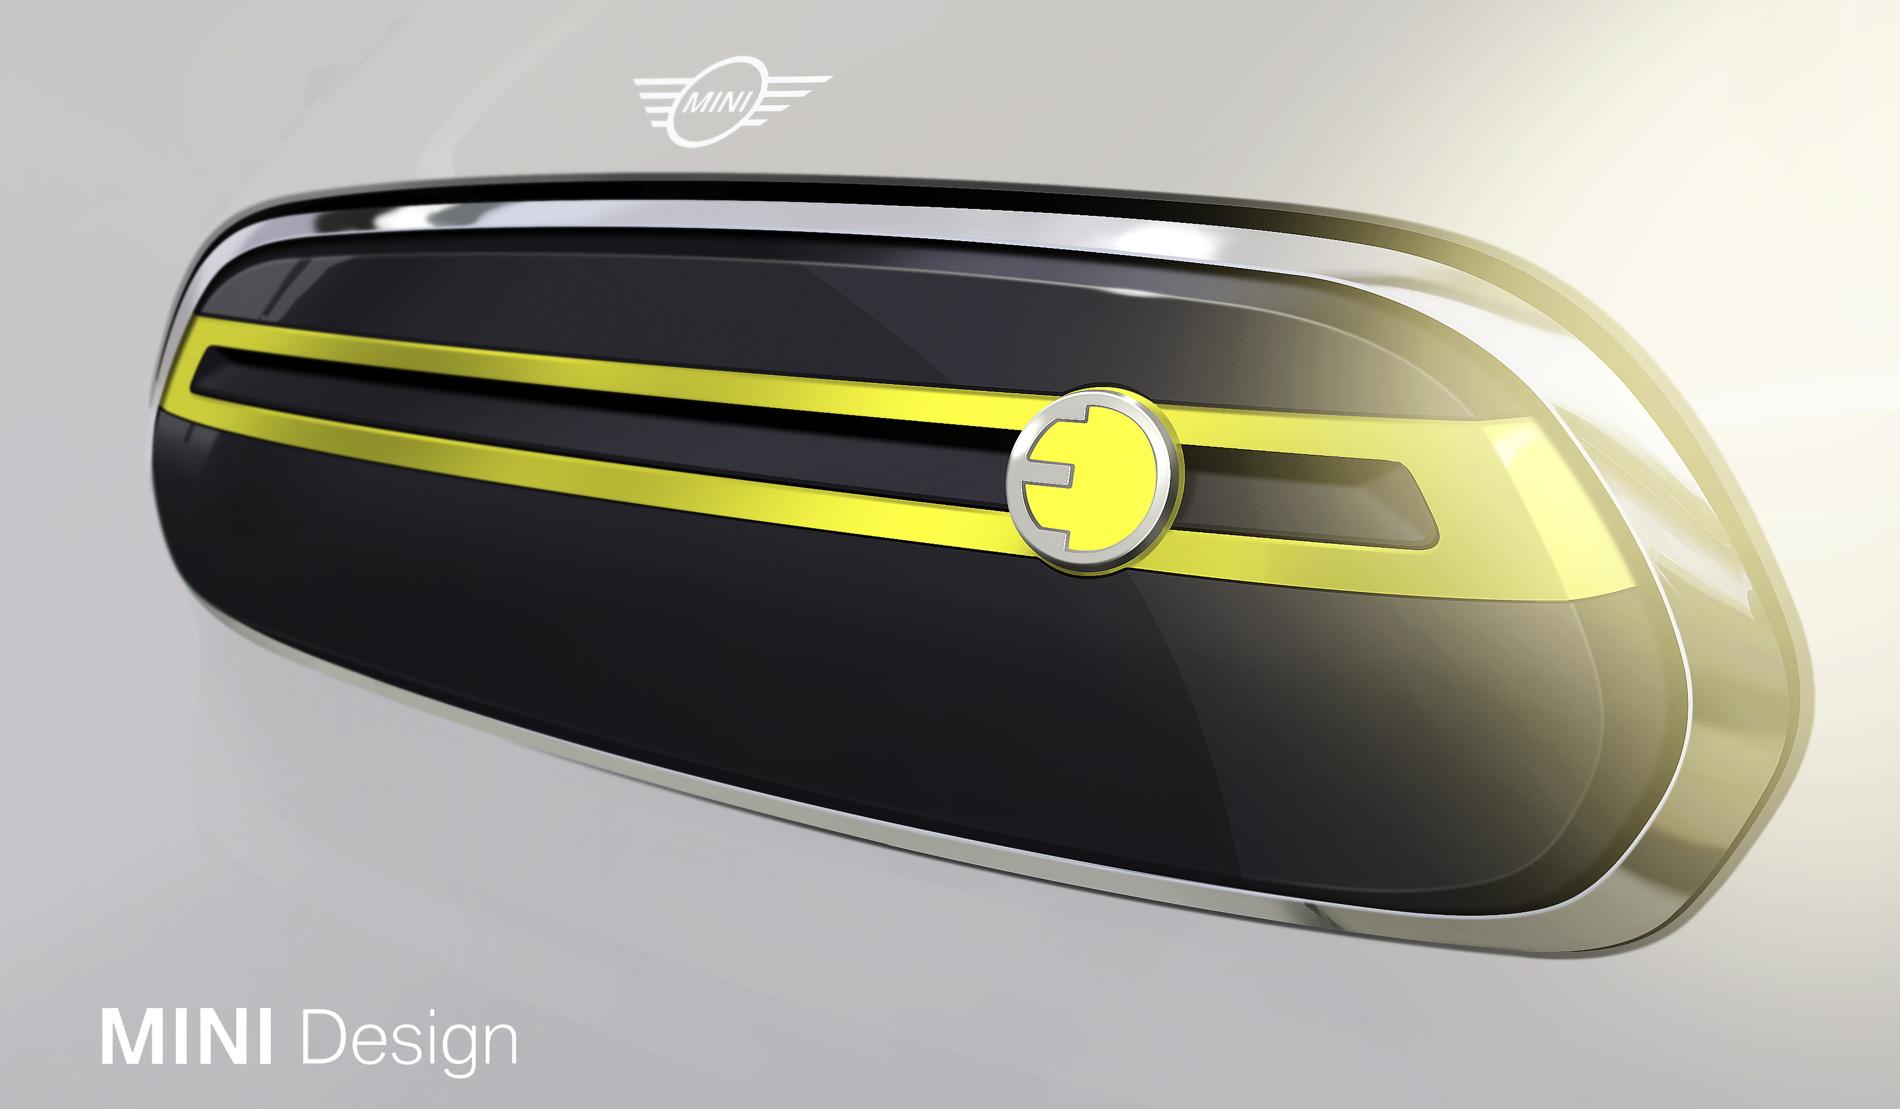 MINI electric car design sketches 01